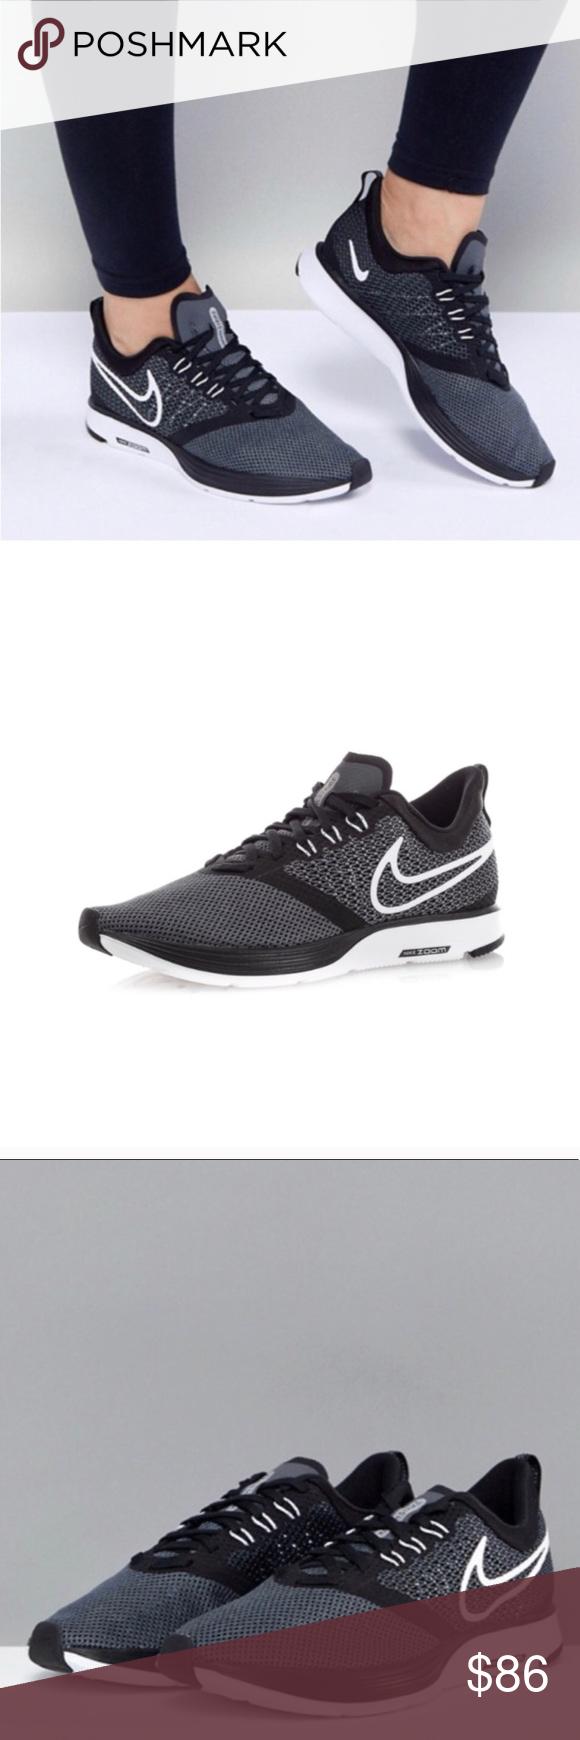 f6b98c4a8de5f Nike black white running air zoom strike NWT. Women s Nike black